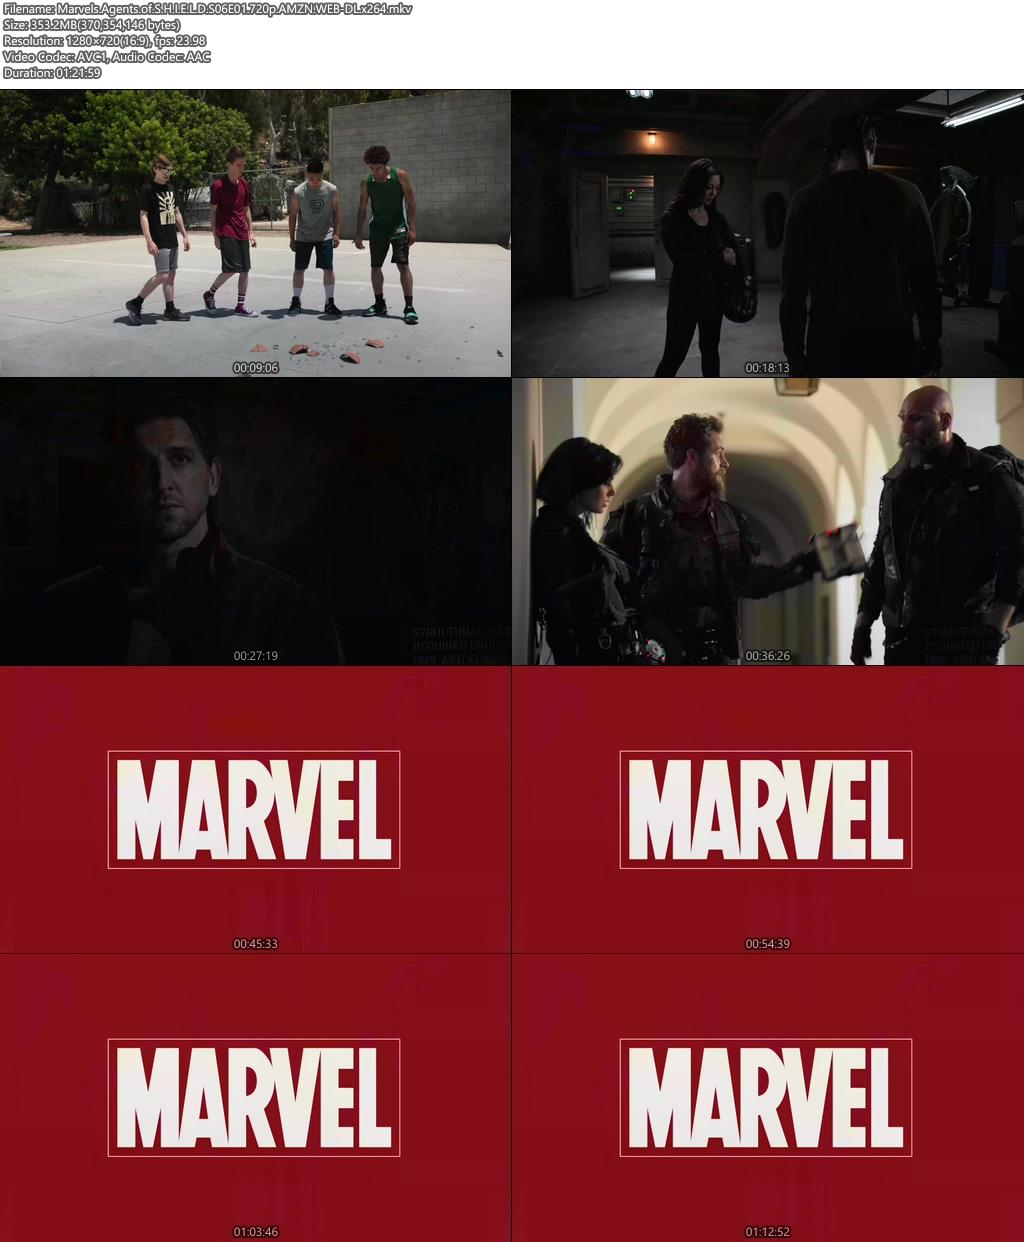 Marvels Agents of S.H.I.E.L.D S06E01 720p AMZN WEB-DL x264 Screenshot